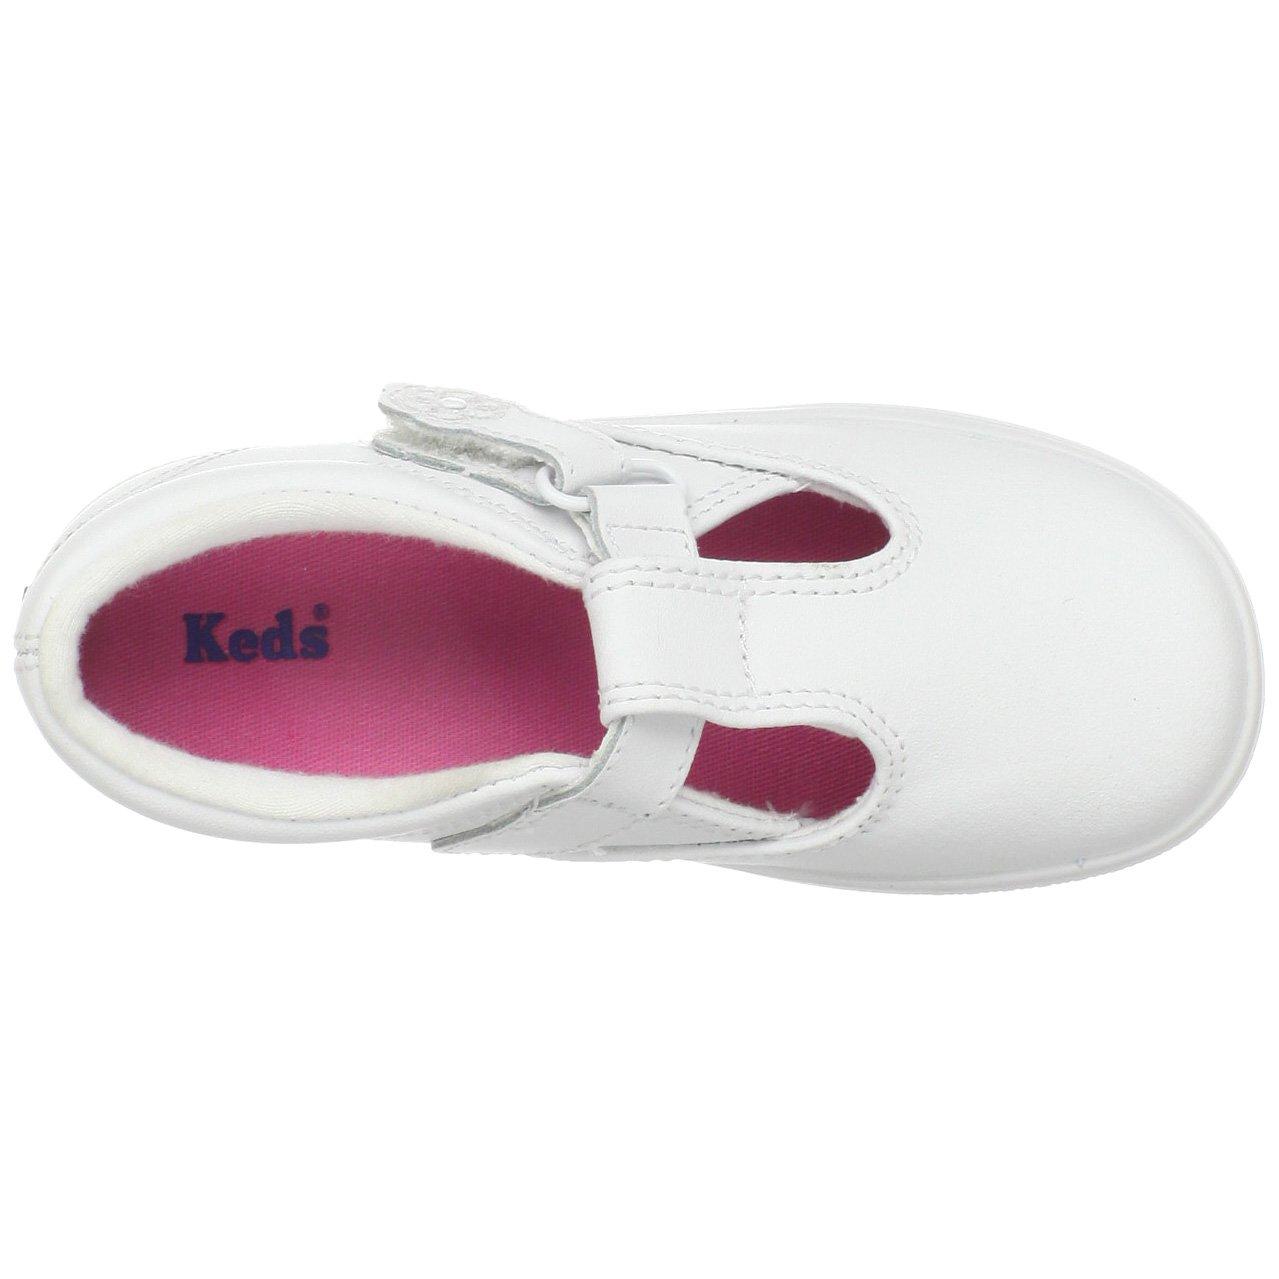 Keds Daphne T-Strap Sneaker (Toddler/Little Kid), White, 12 M US Little Kid by Keds (Image #7)